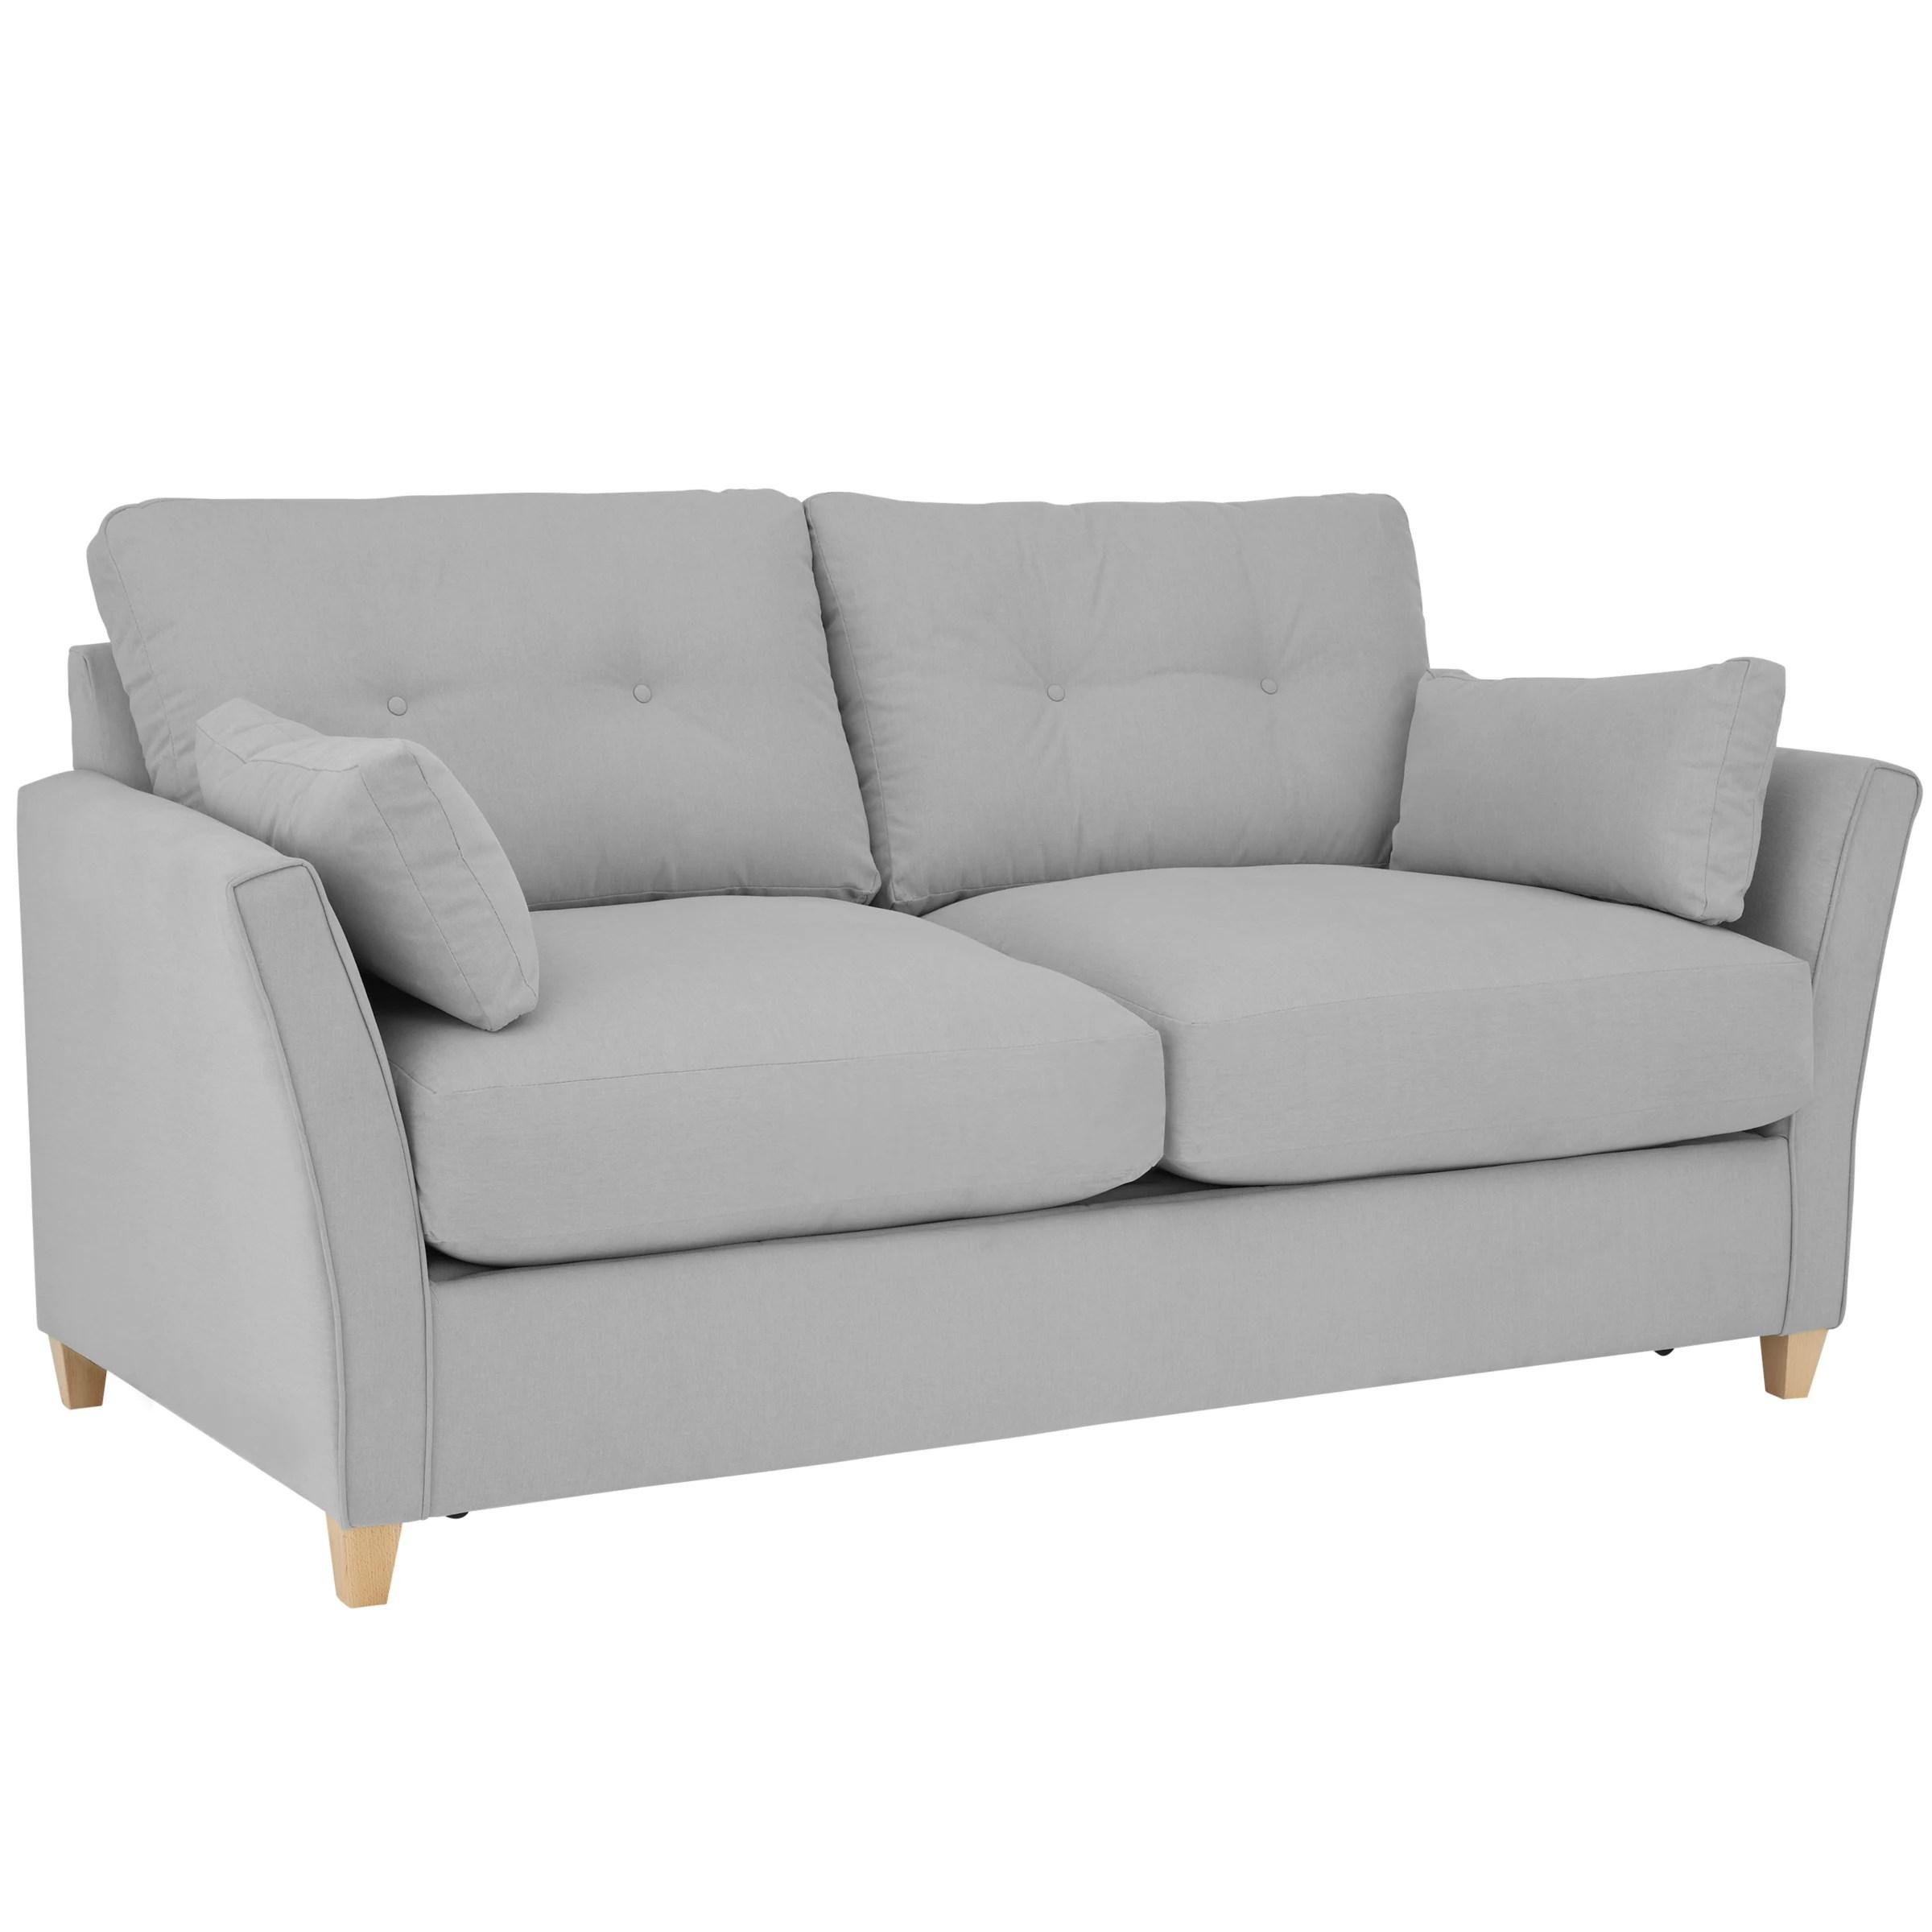 medium sofa bed rory microfiber sleeper john lewis chopin small baci living room